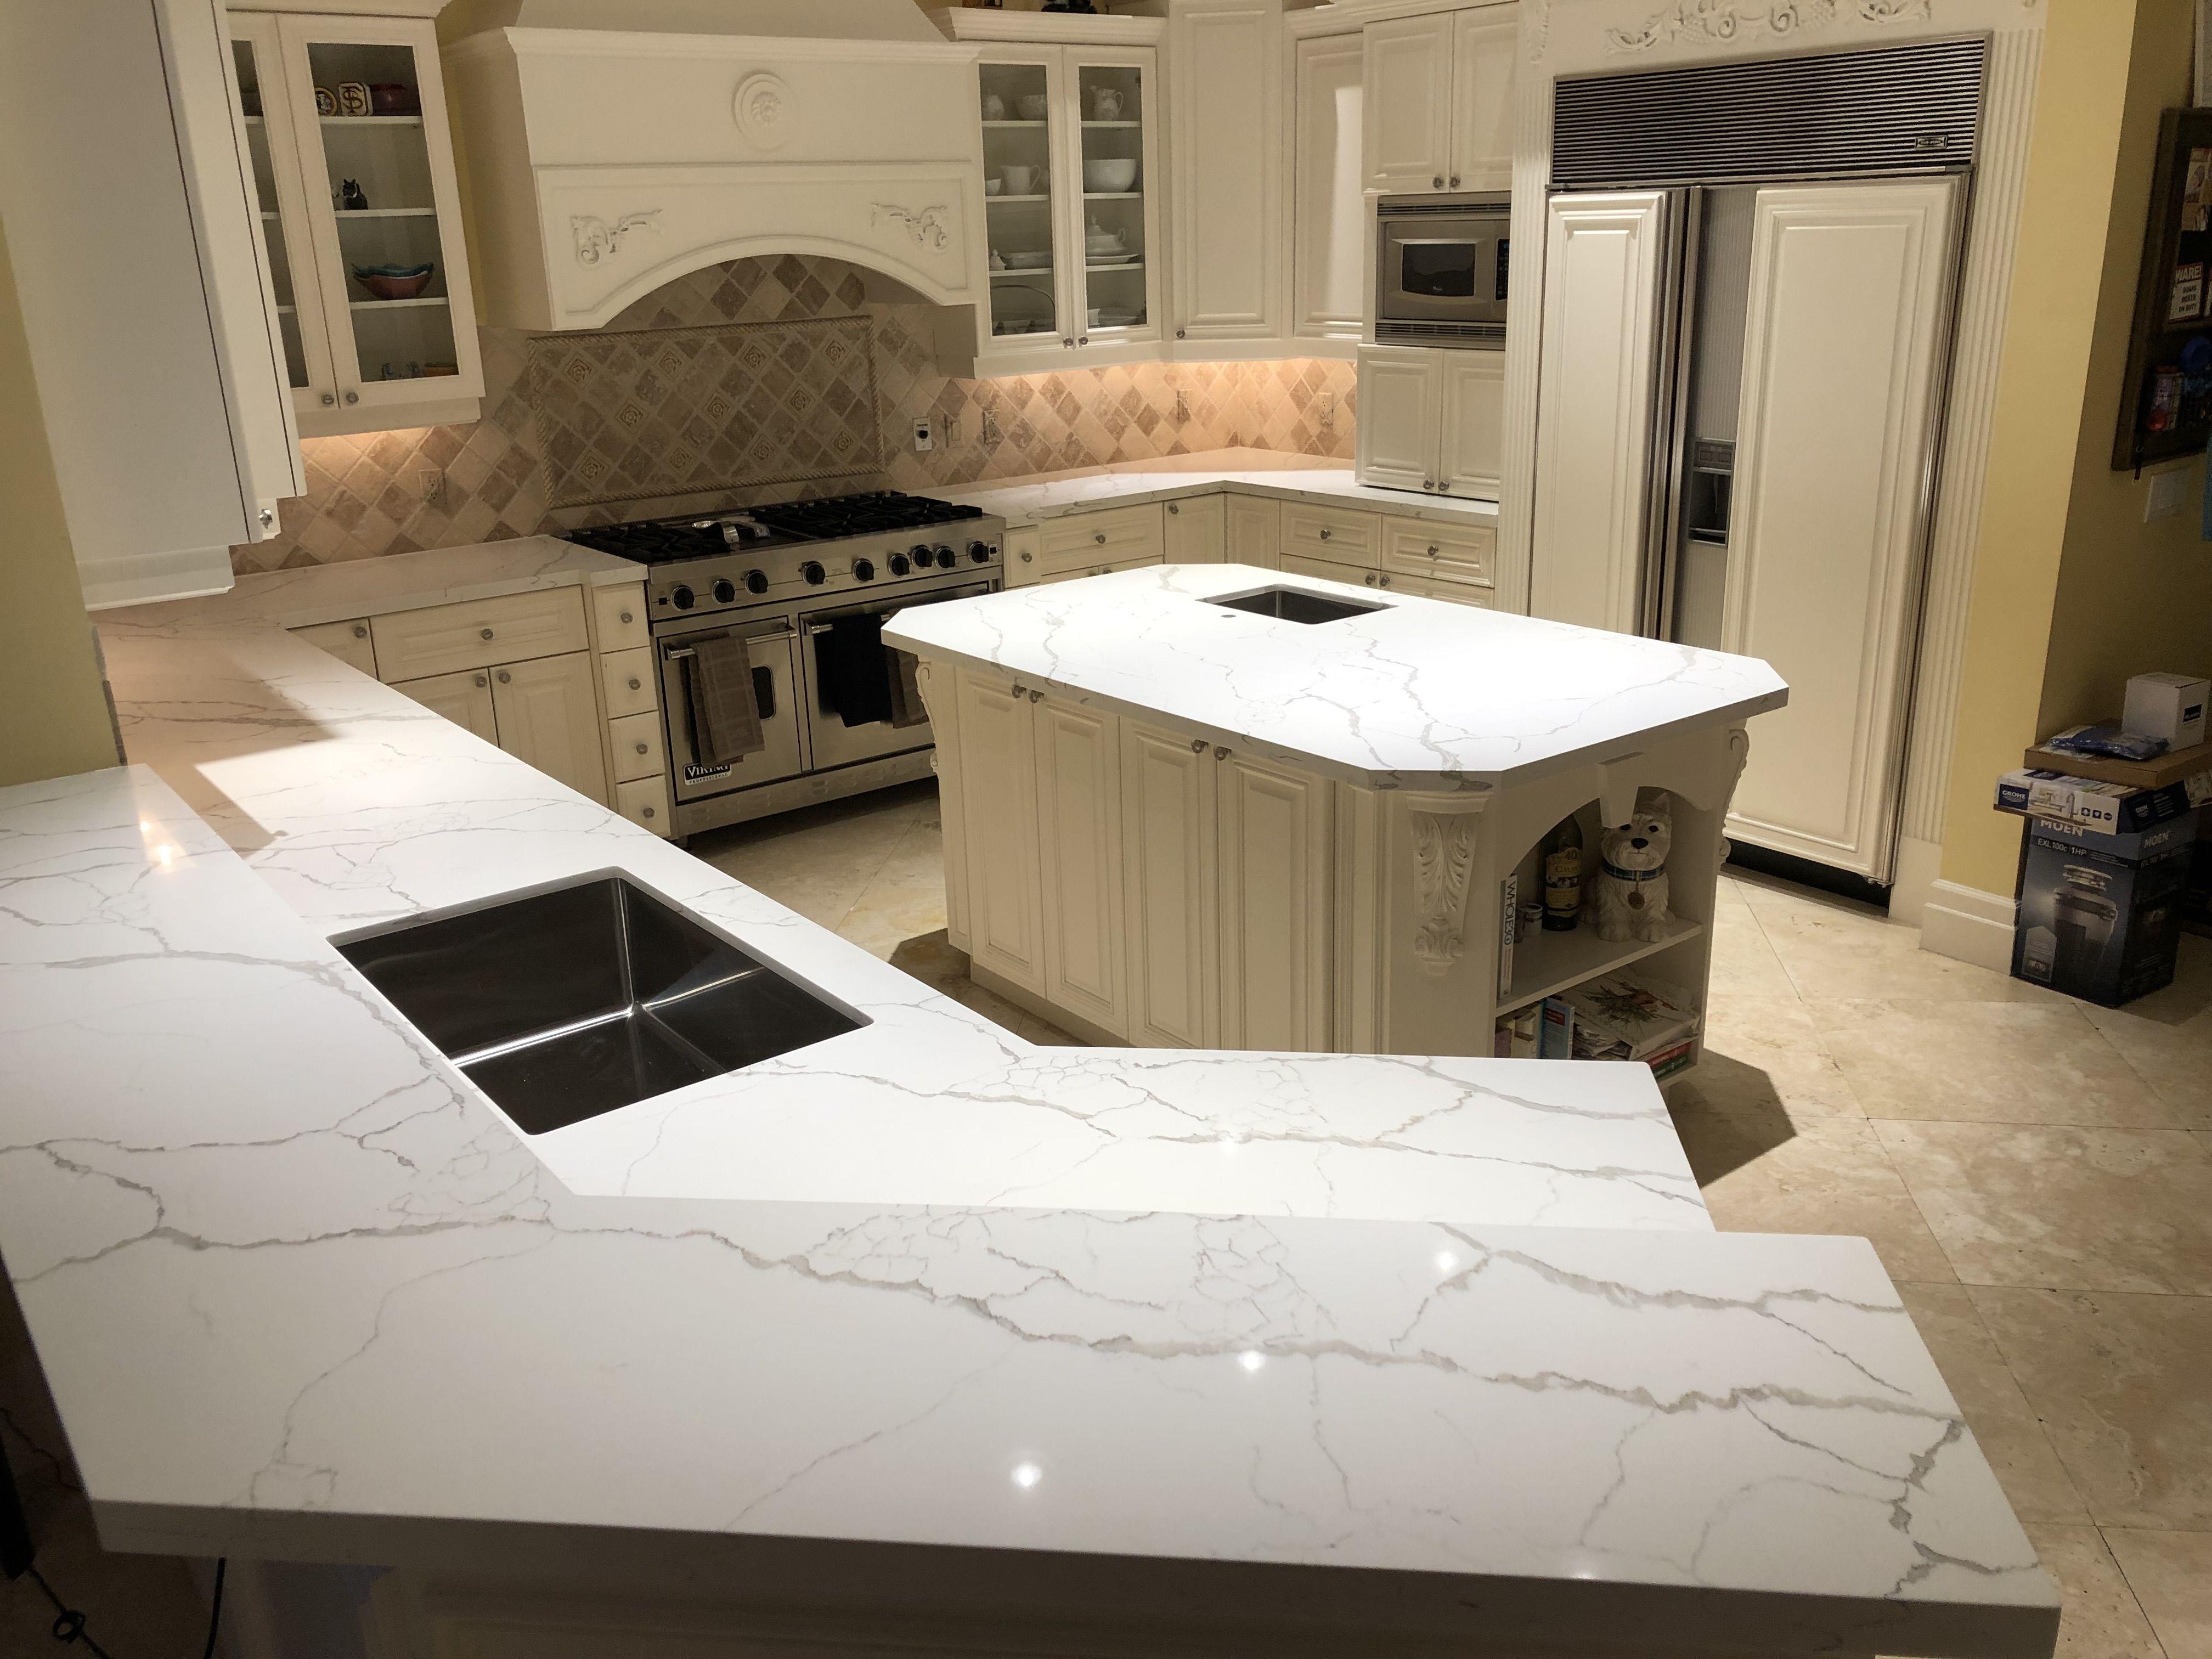 How Do Calacatta Laza Quartz Countertops Look Installed Boca